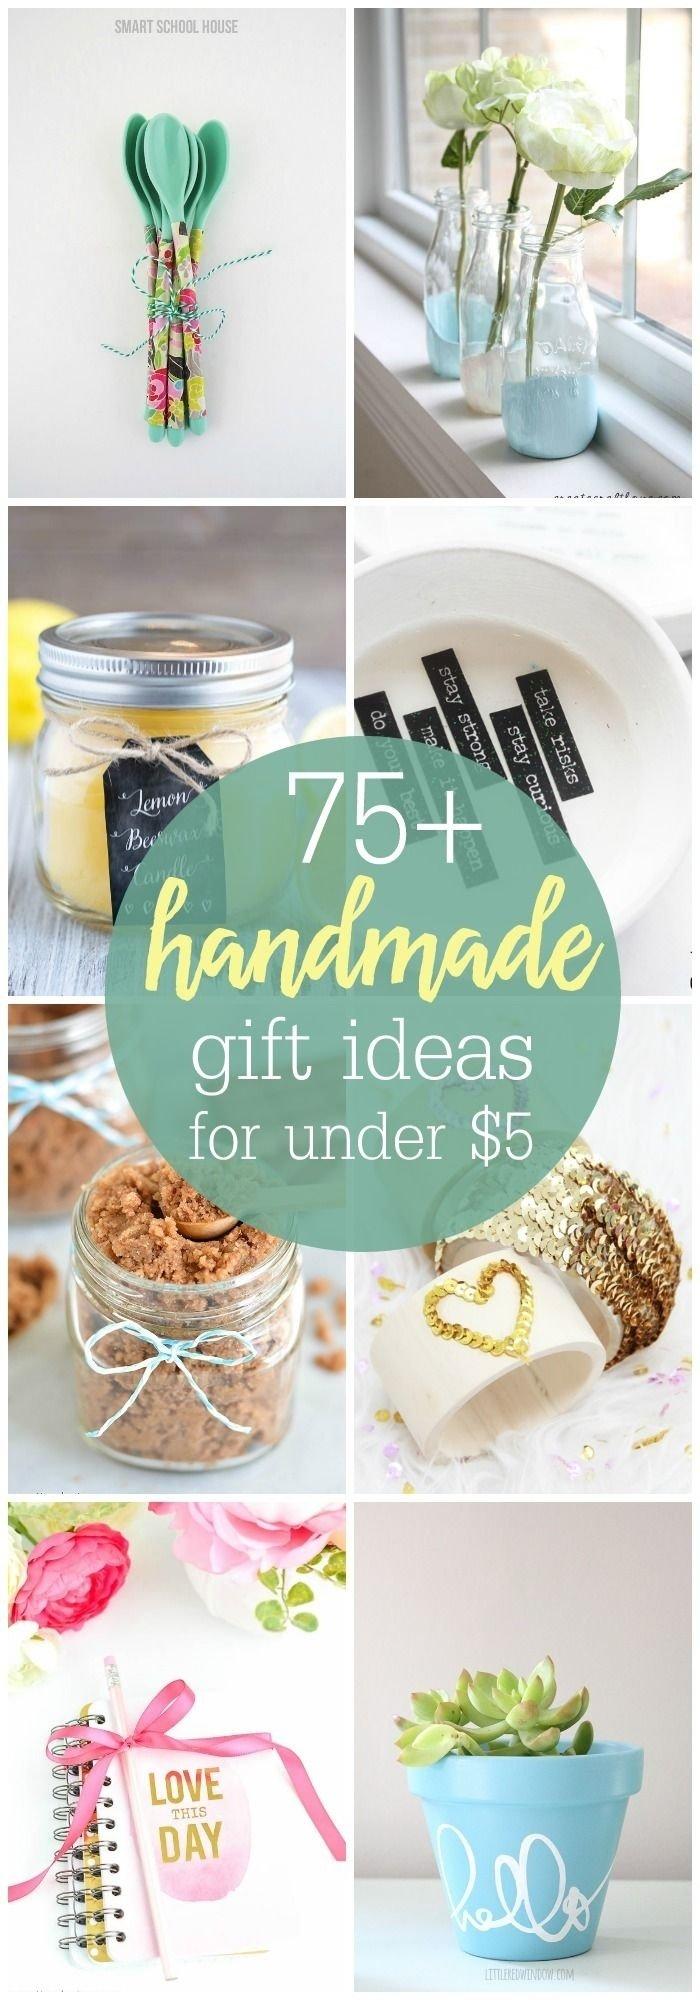 10 Spectacular Homemade Gift Ideas For Girls 1603 best gift ideas images on pinterest gift ideas mothers day 2021